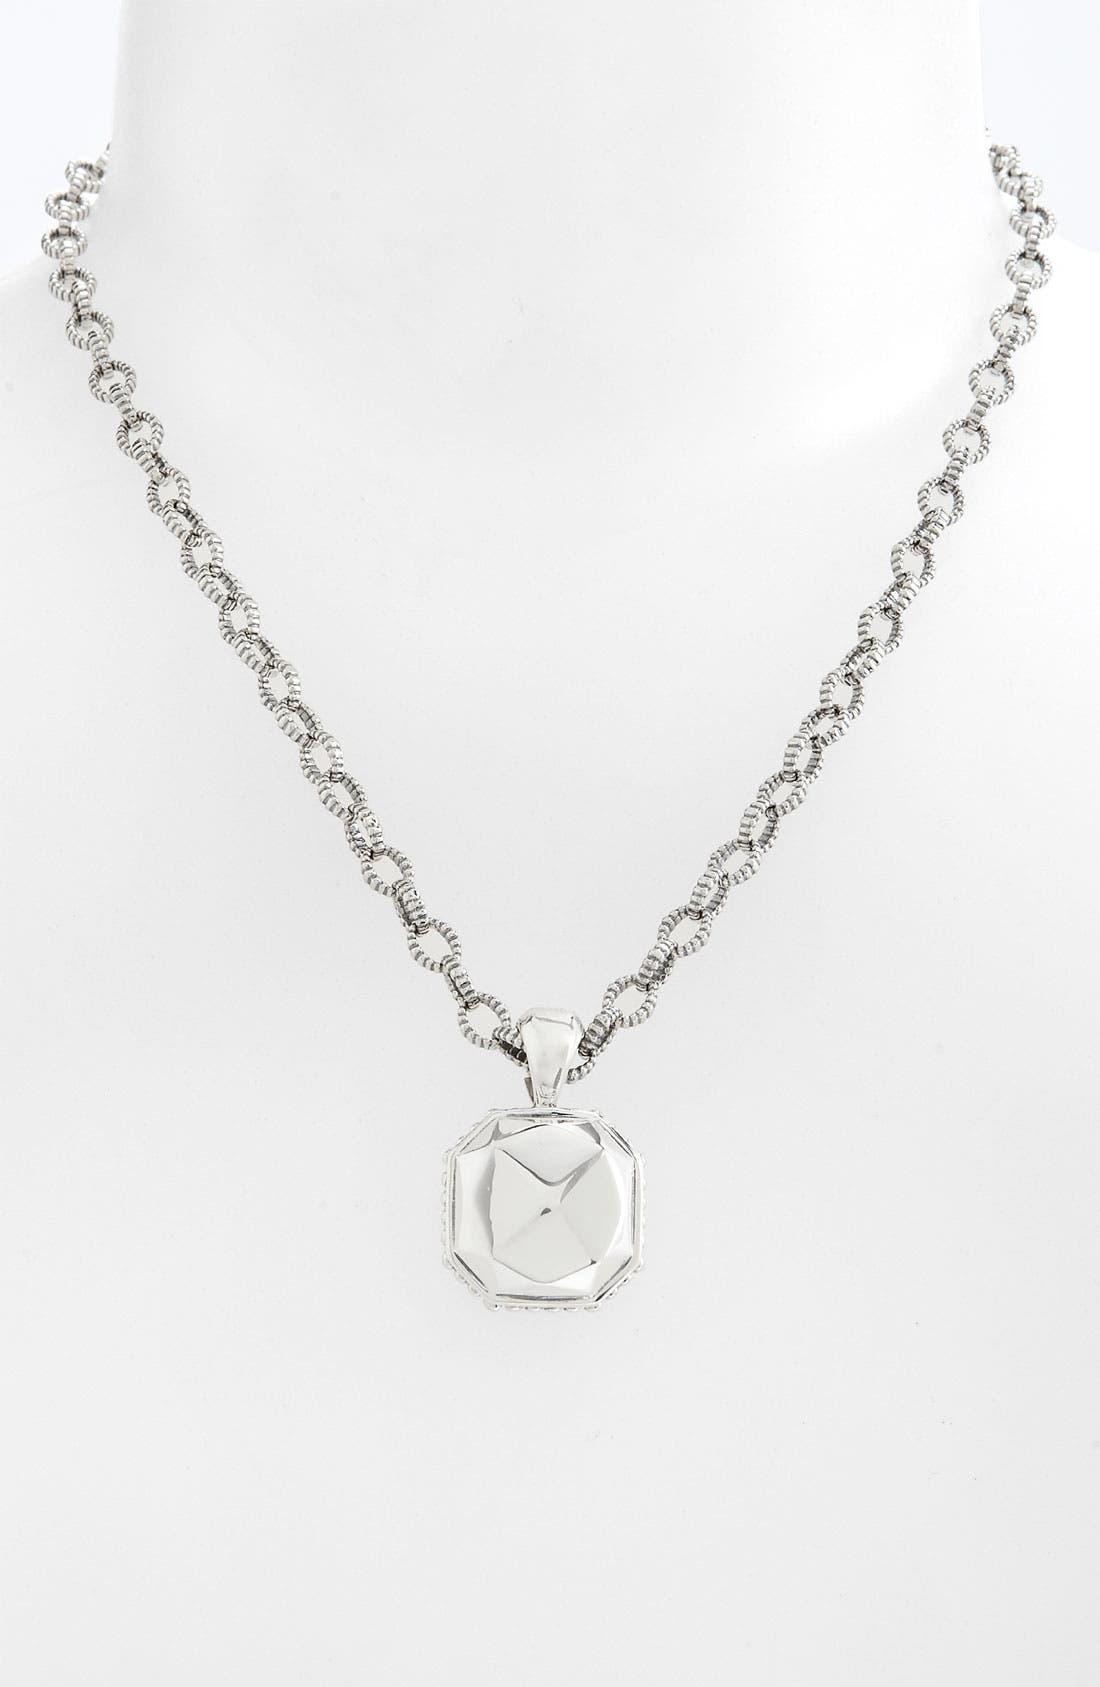 Alternate Image 1 Selected - LAGOS 'Rocks' Square Pendant Necklace